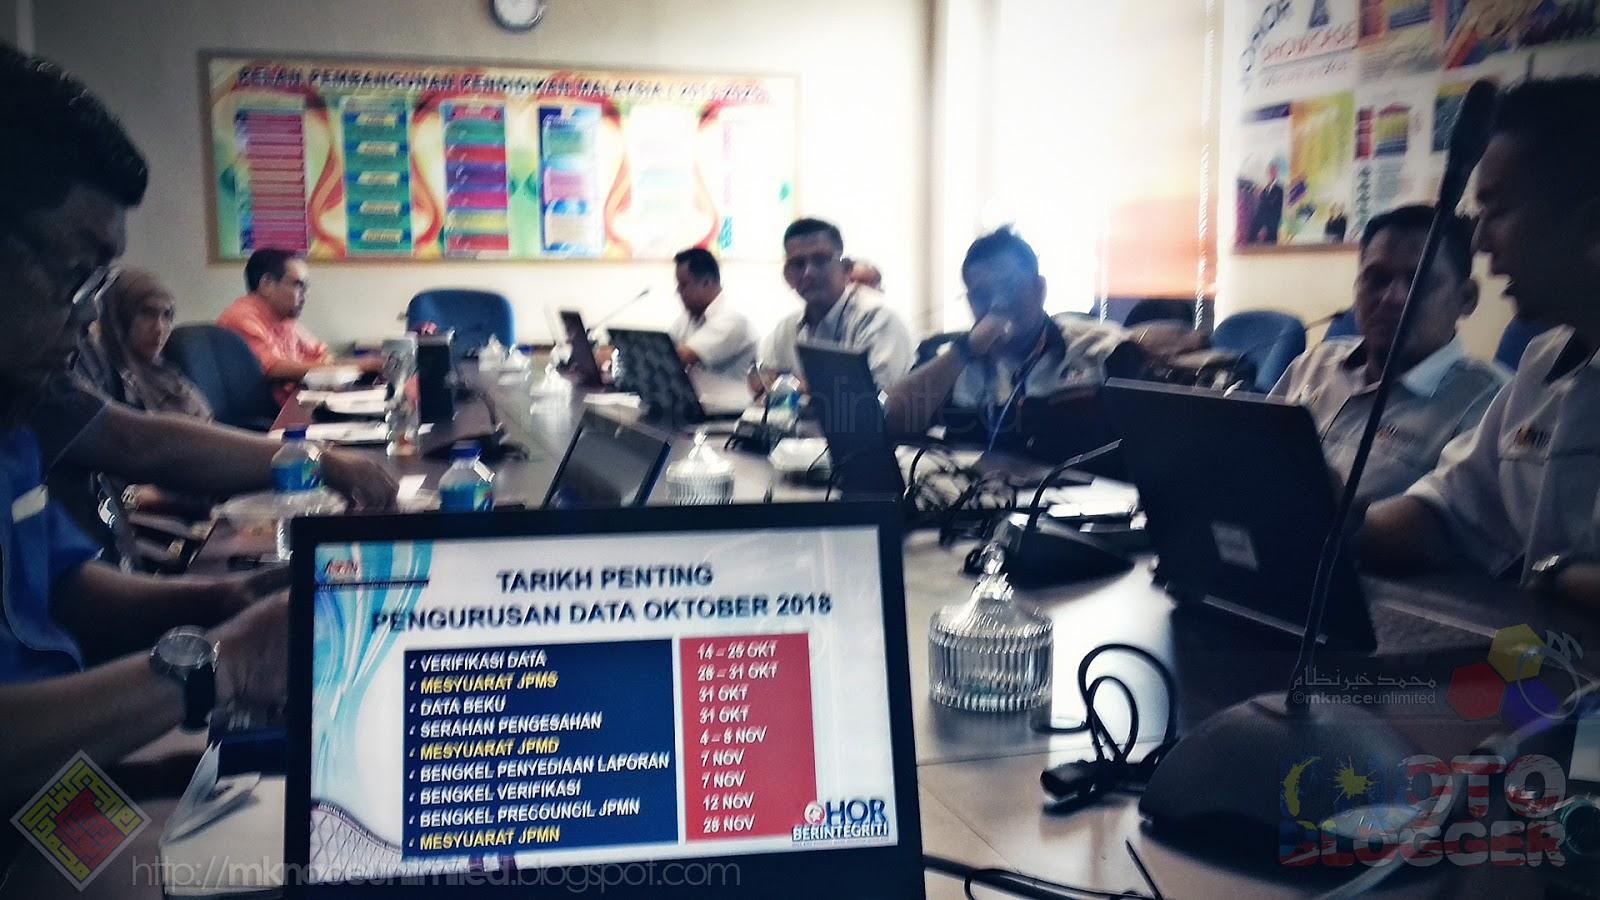 Bengkel Fokus Kutipan Data Rasmi Oktober Negeri Johor 2018 Mknace Gudang Garam Filter 12 Batang Gp Garpit International Ahad Lepas Dilaksanakan Di Bilik Spi Kita Akan Gunakan Repositori